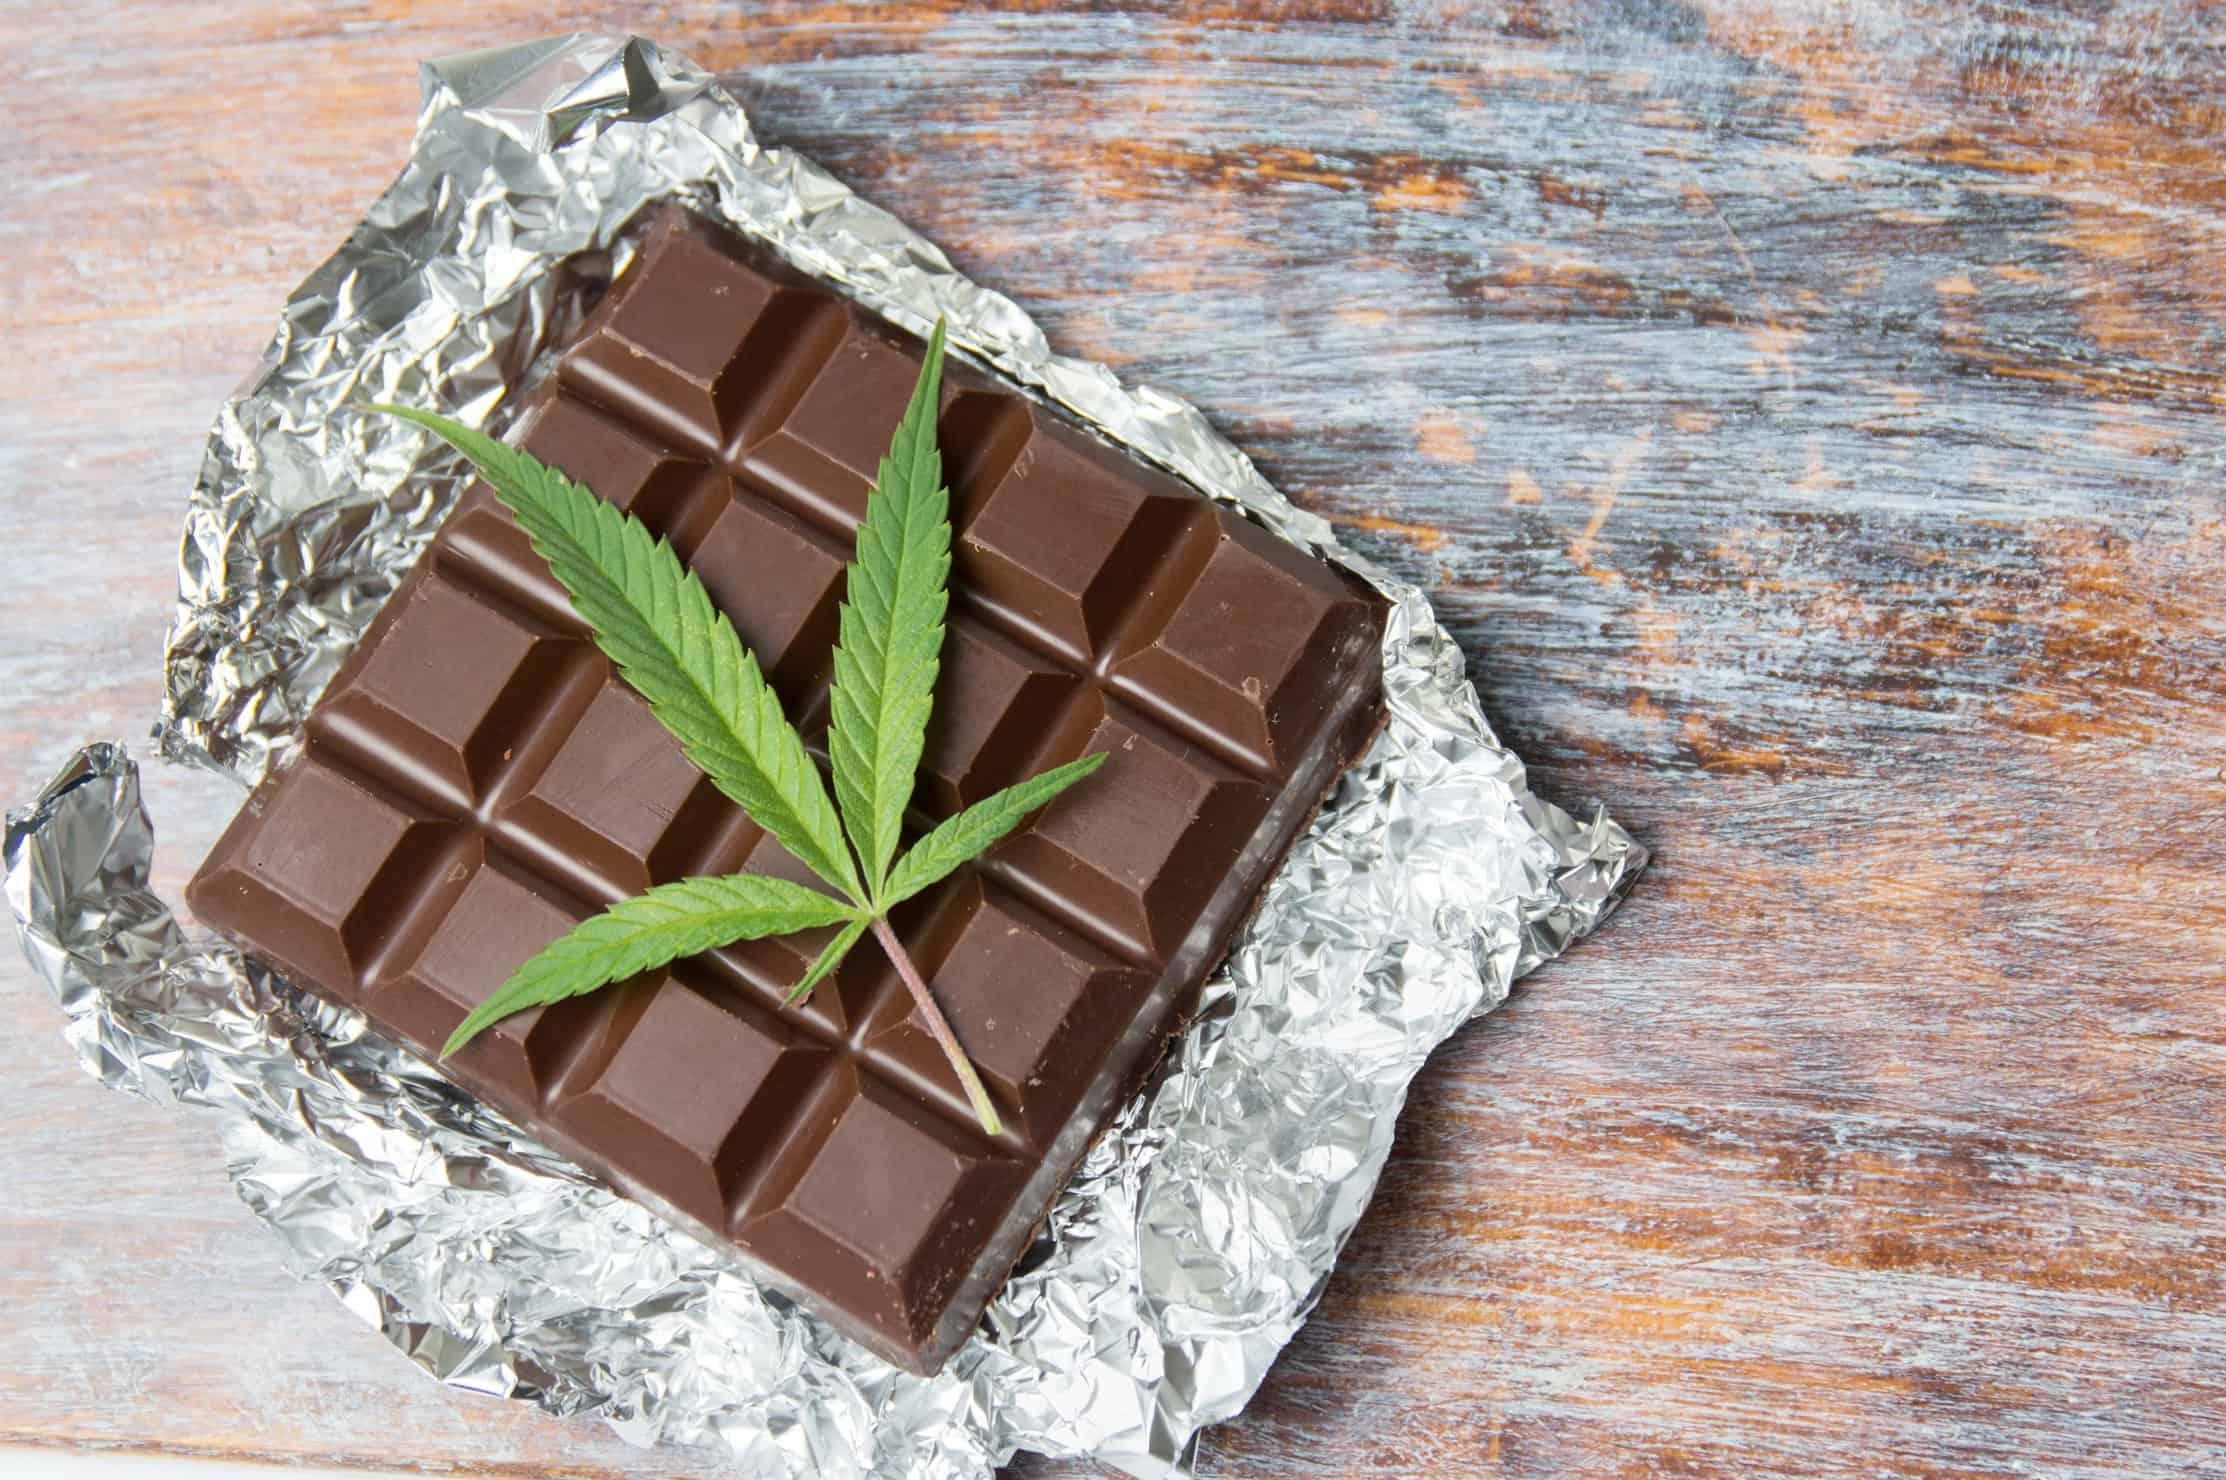 Controlling potency of marijuana edibles